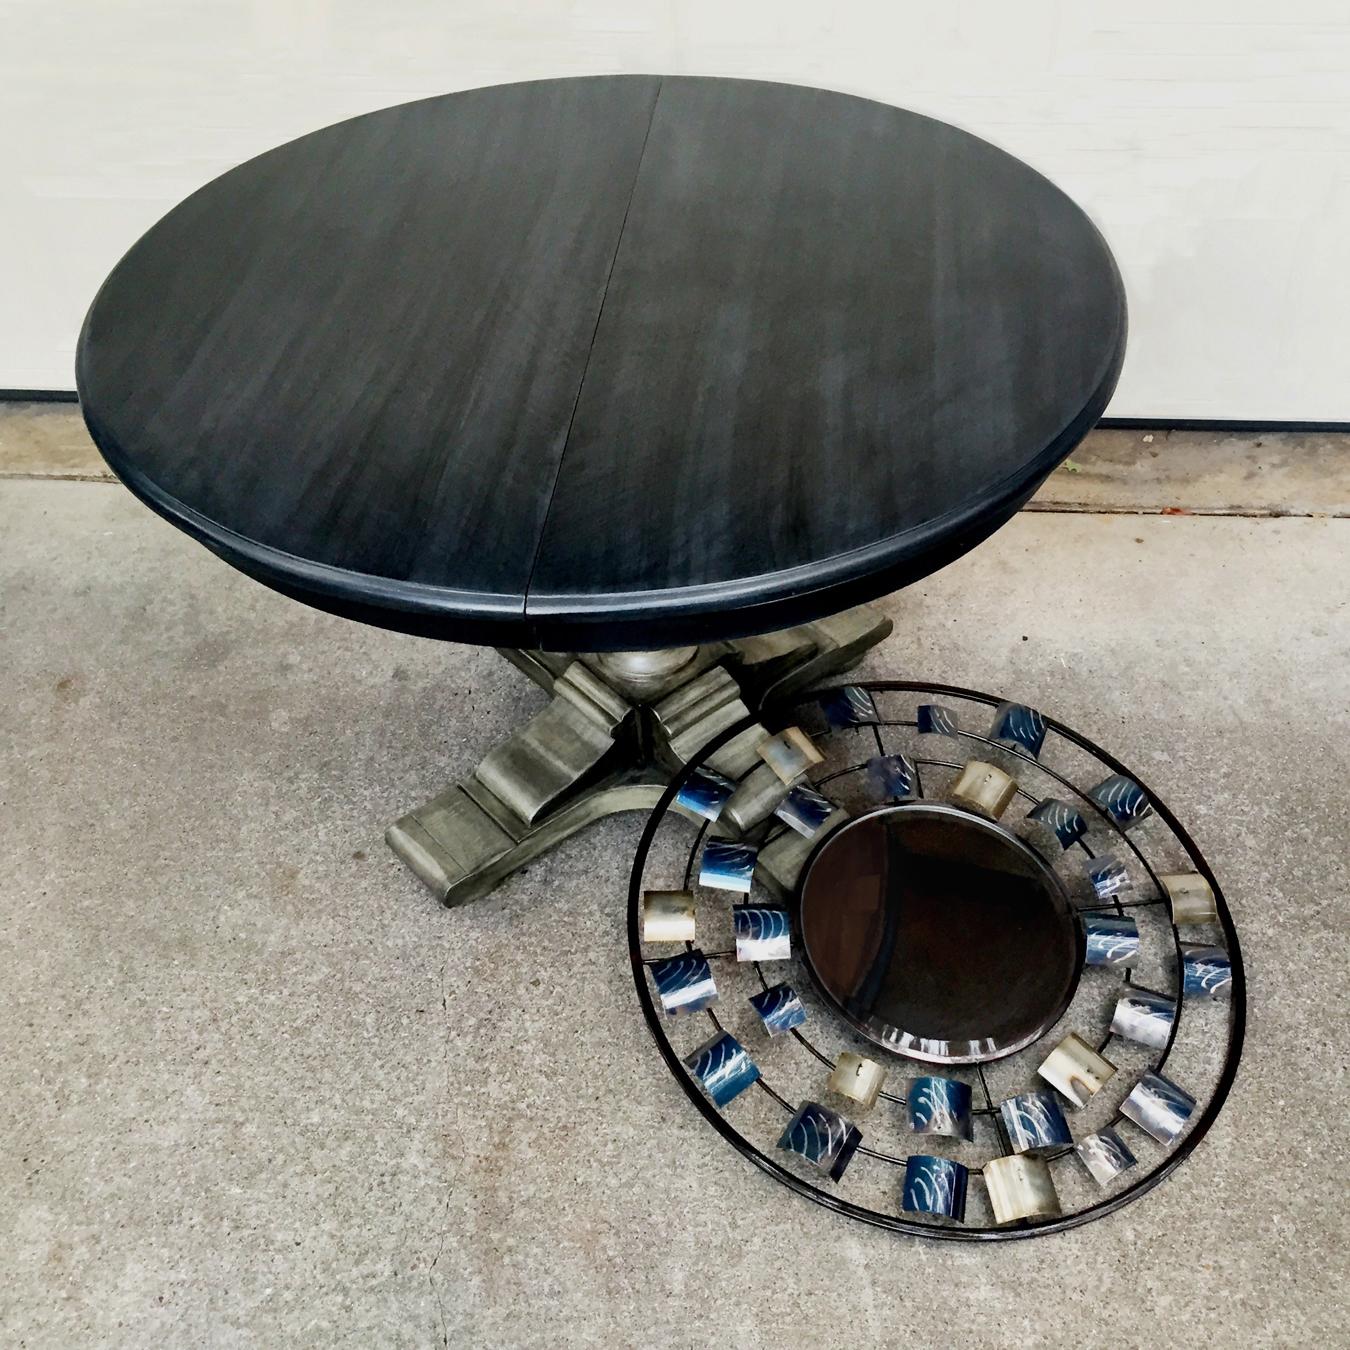 crimson + oak designs | graphite pearl pedestal table 2 C .jpg